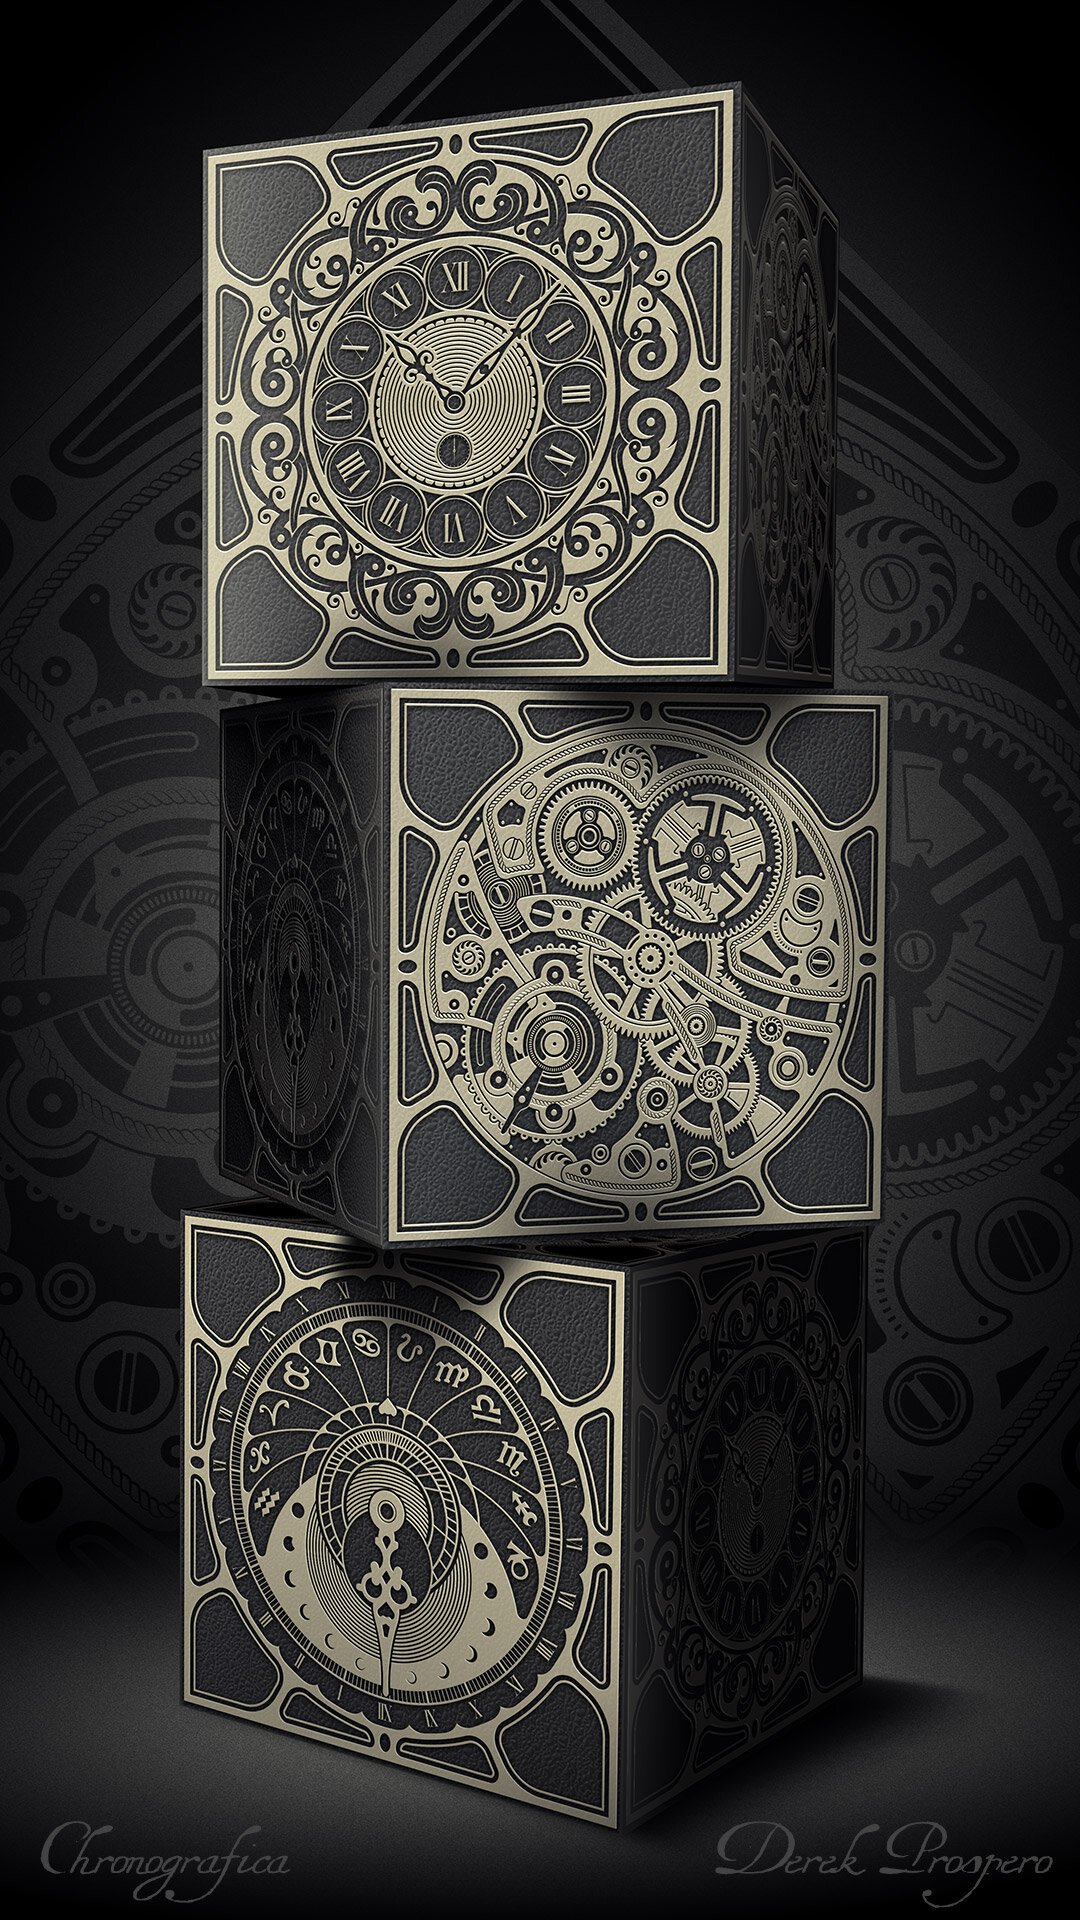 cube-chrono-2.jpg